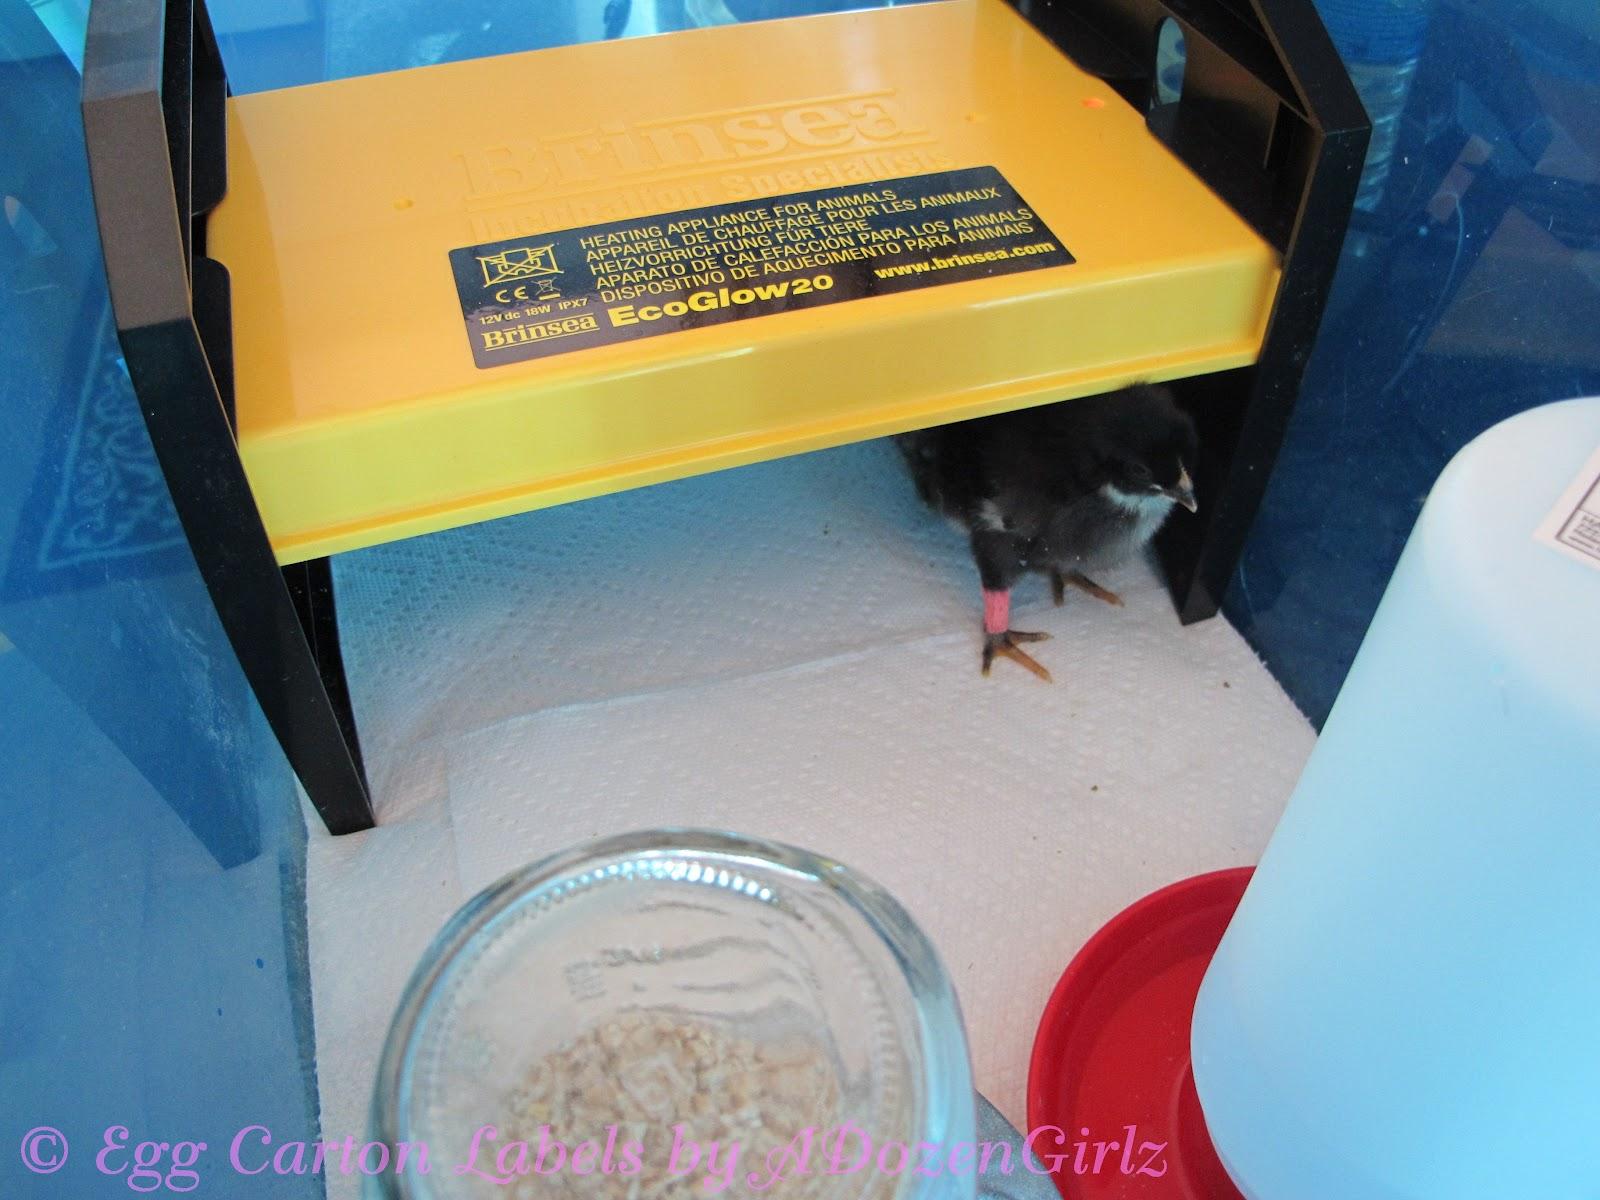 The Chicken Chick: Brinsea EcoGlow 20 GIVEAWAY!